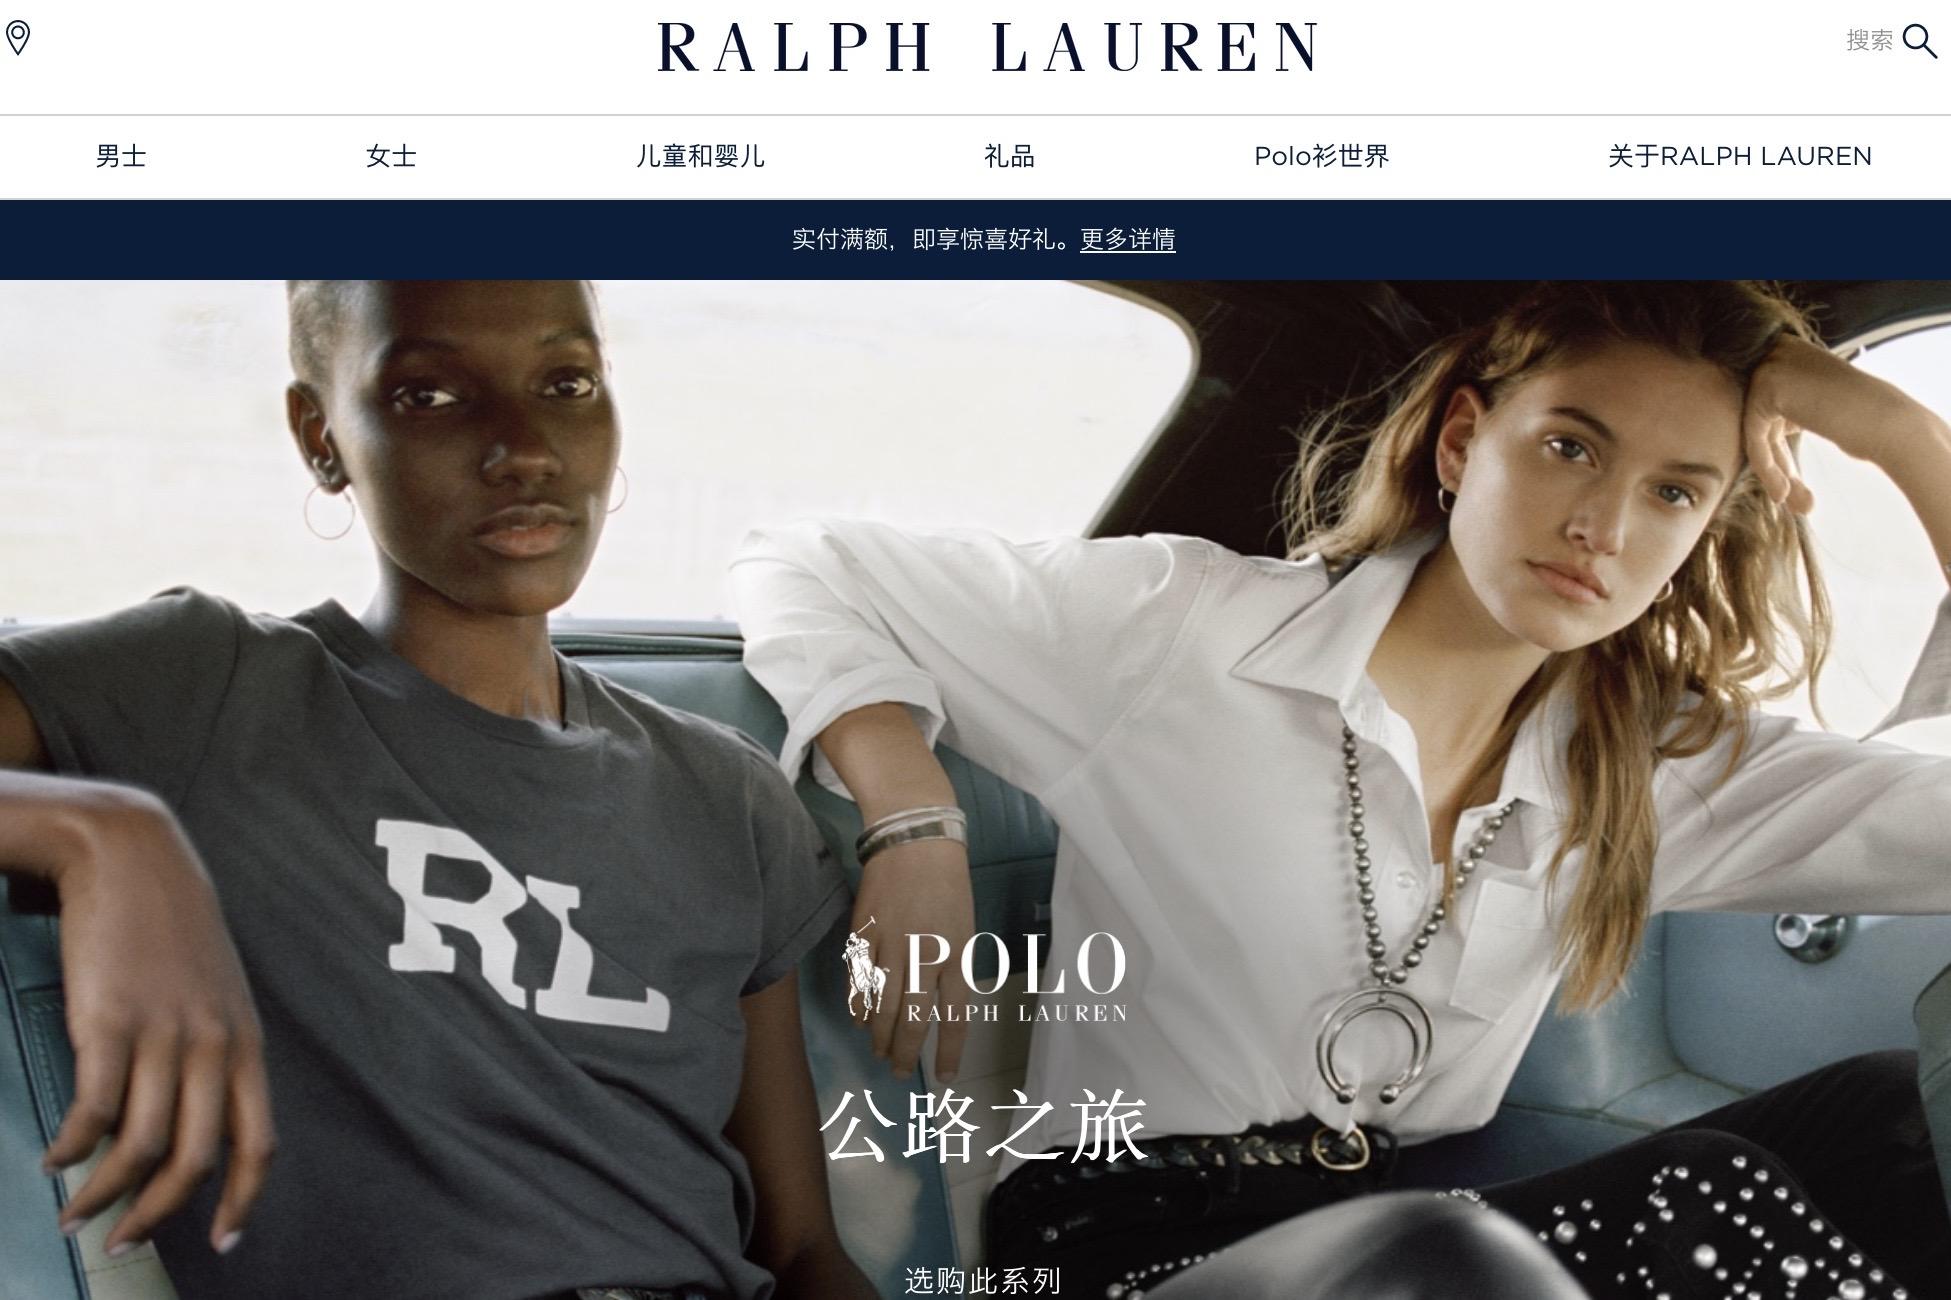 Ralph Lauren 或将裁员15%,精简组织结构并加速向线上转型